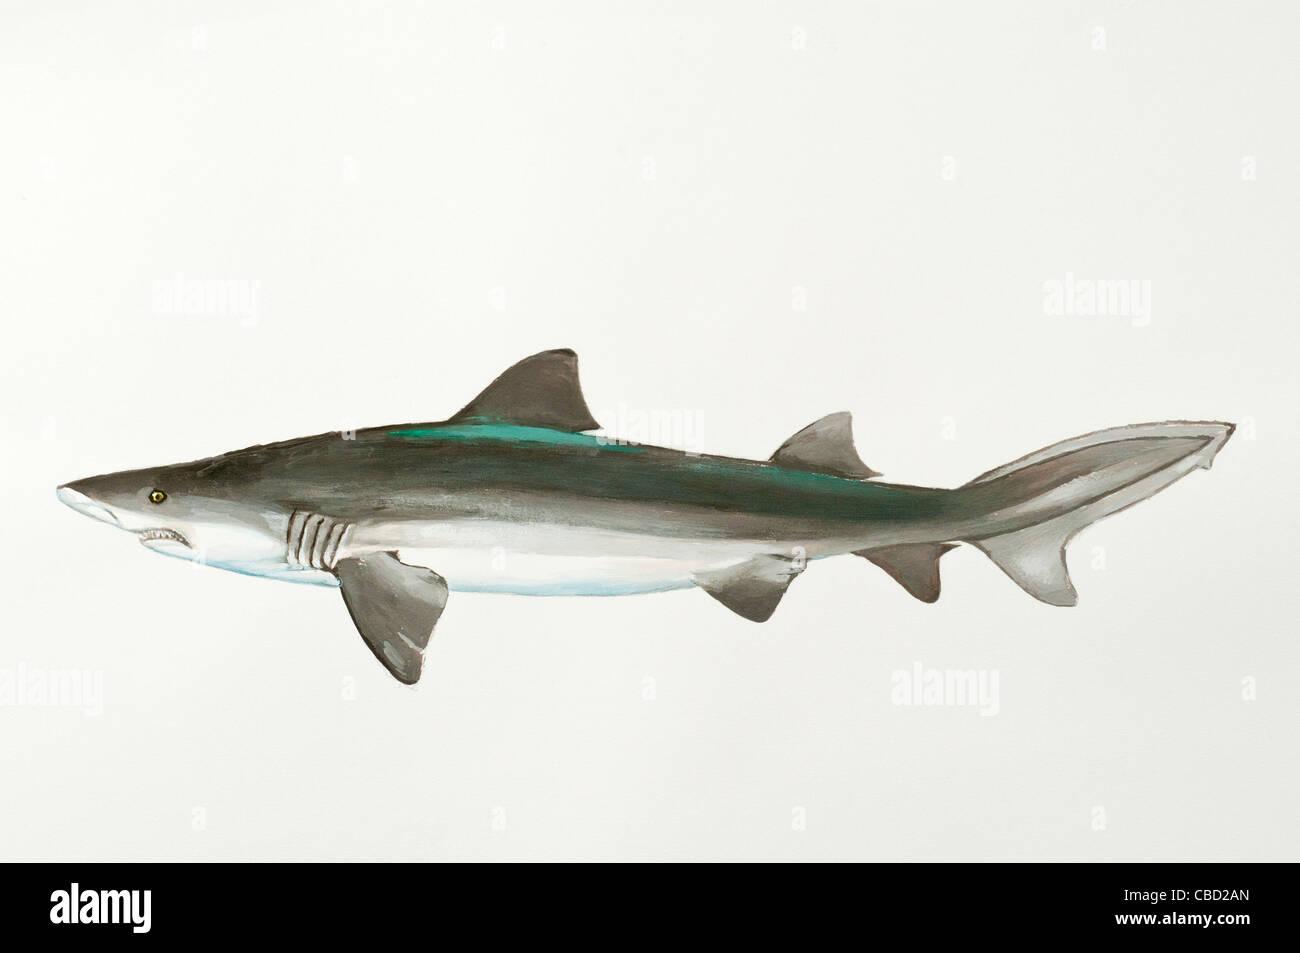 Ragged-Tooth Shark Odontaspis ferox, Oontaspididae - Stock Image